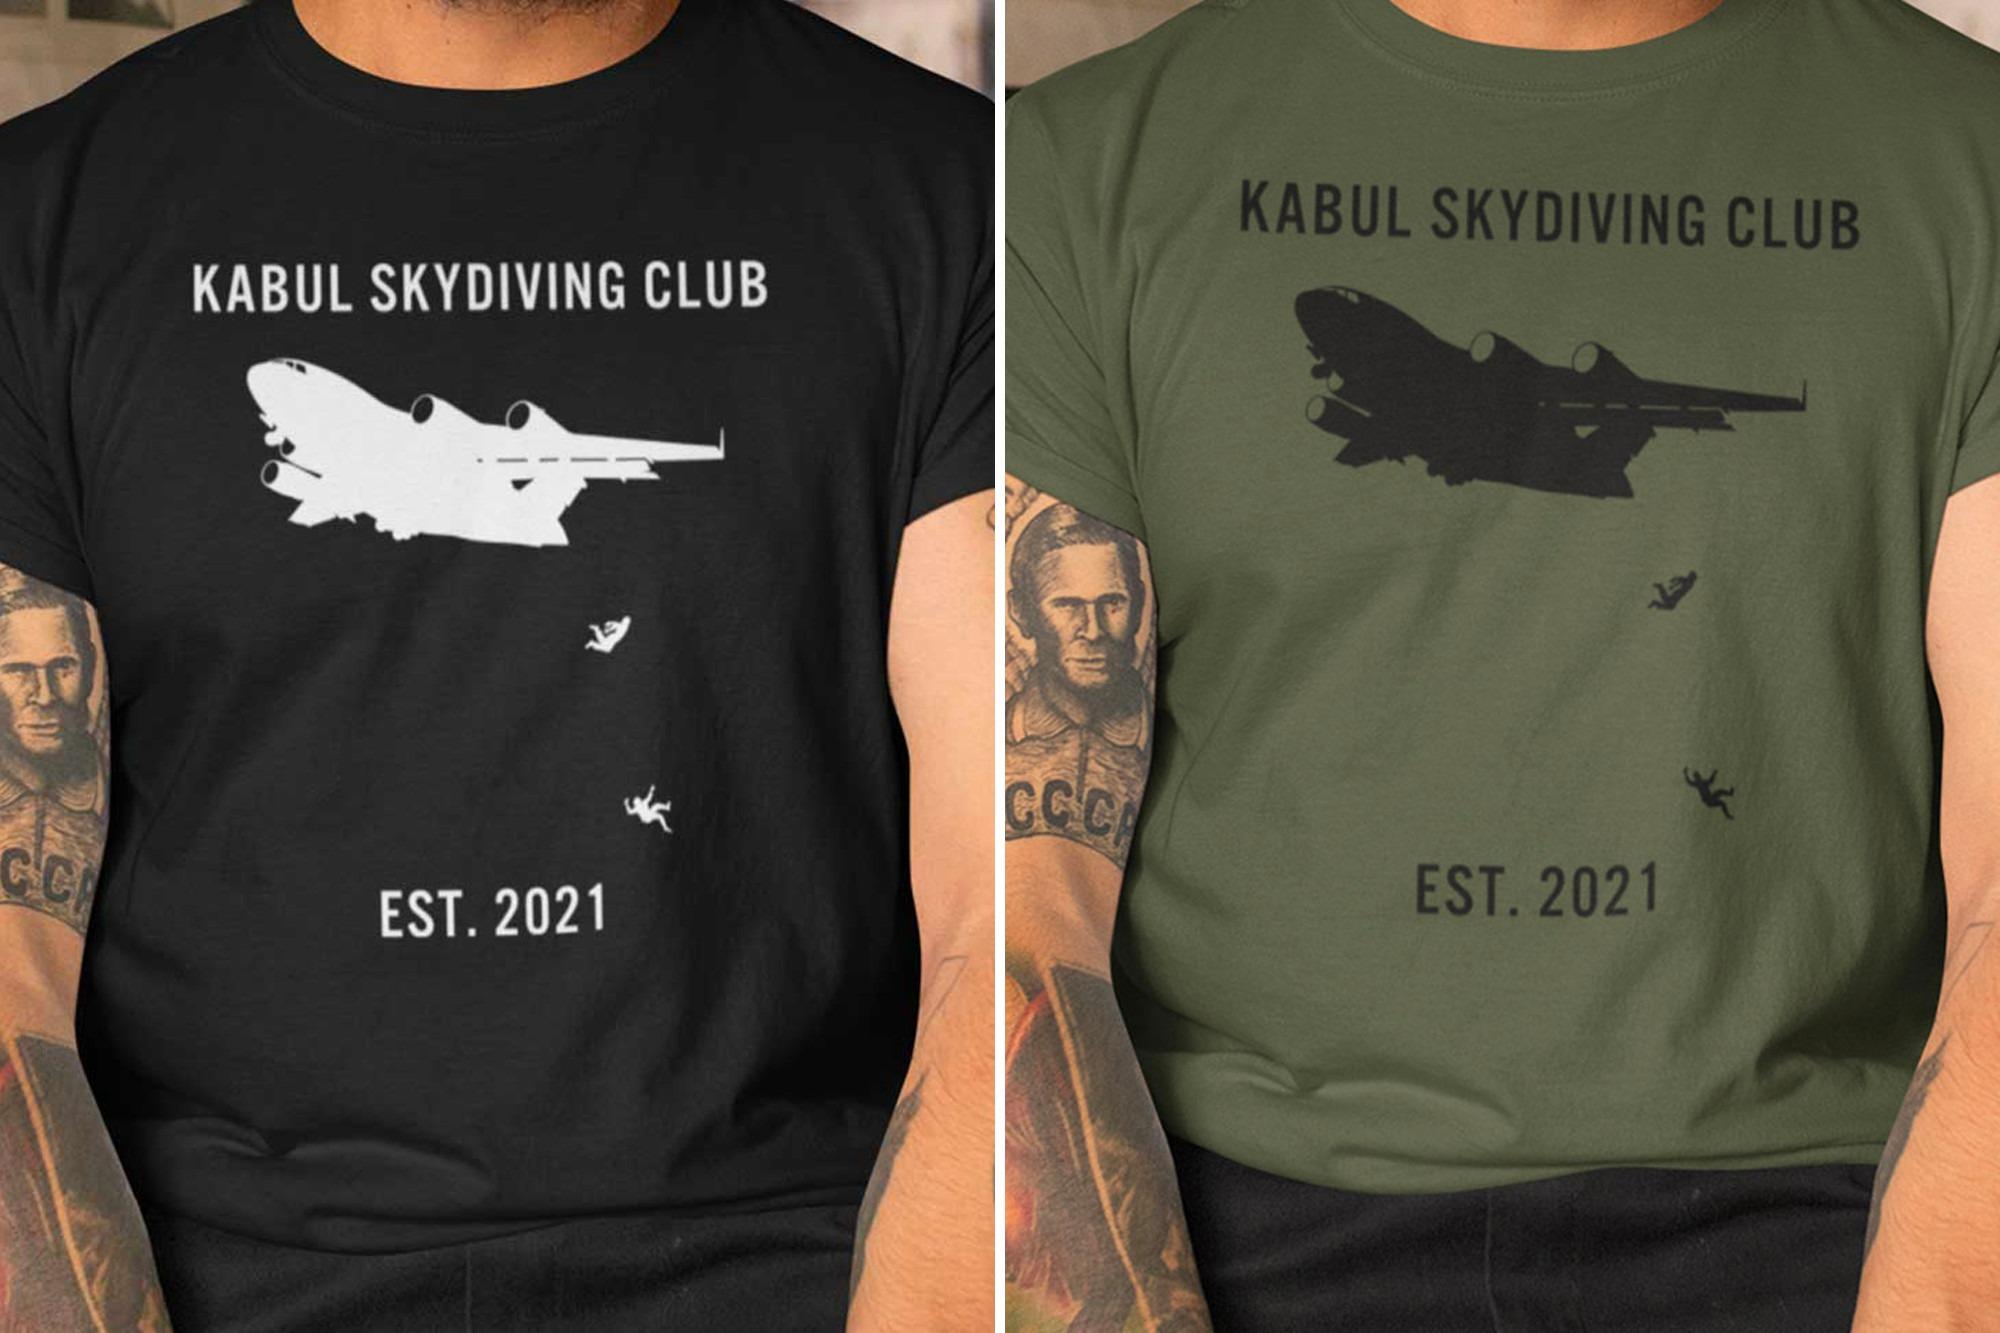 """Kabul Skydiving Club"", U.S. shirt mocks Afghan victims"